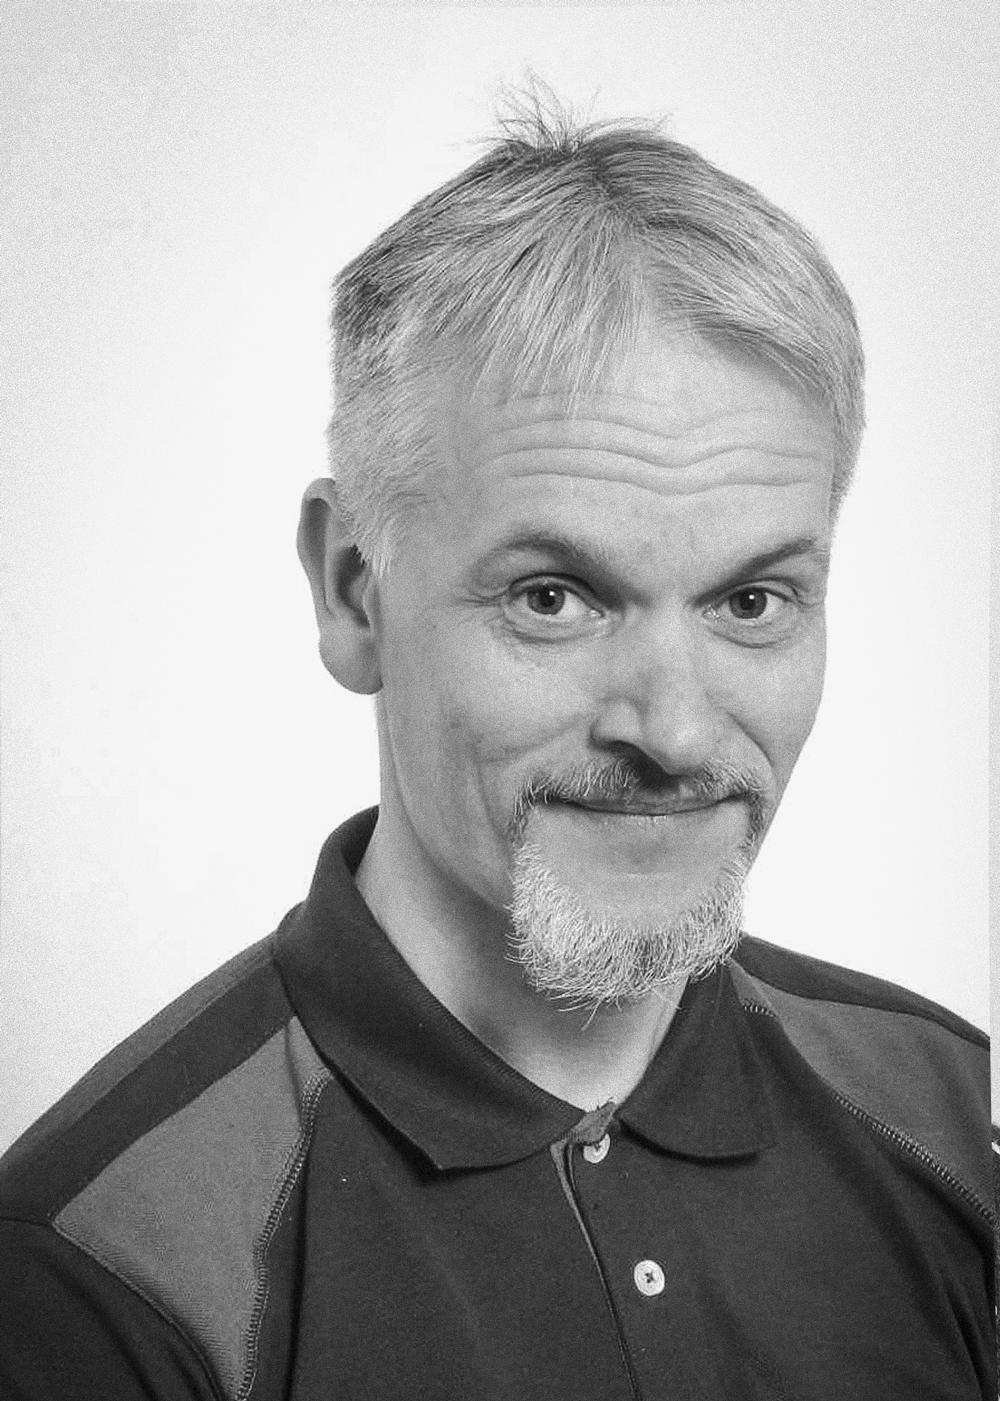 Torgeir Monsen  Teknisk prosjekt 975 16 392  torgeir@havbruksloggen.no